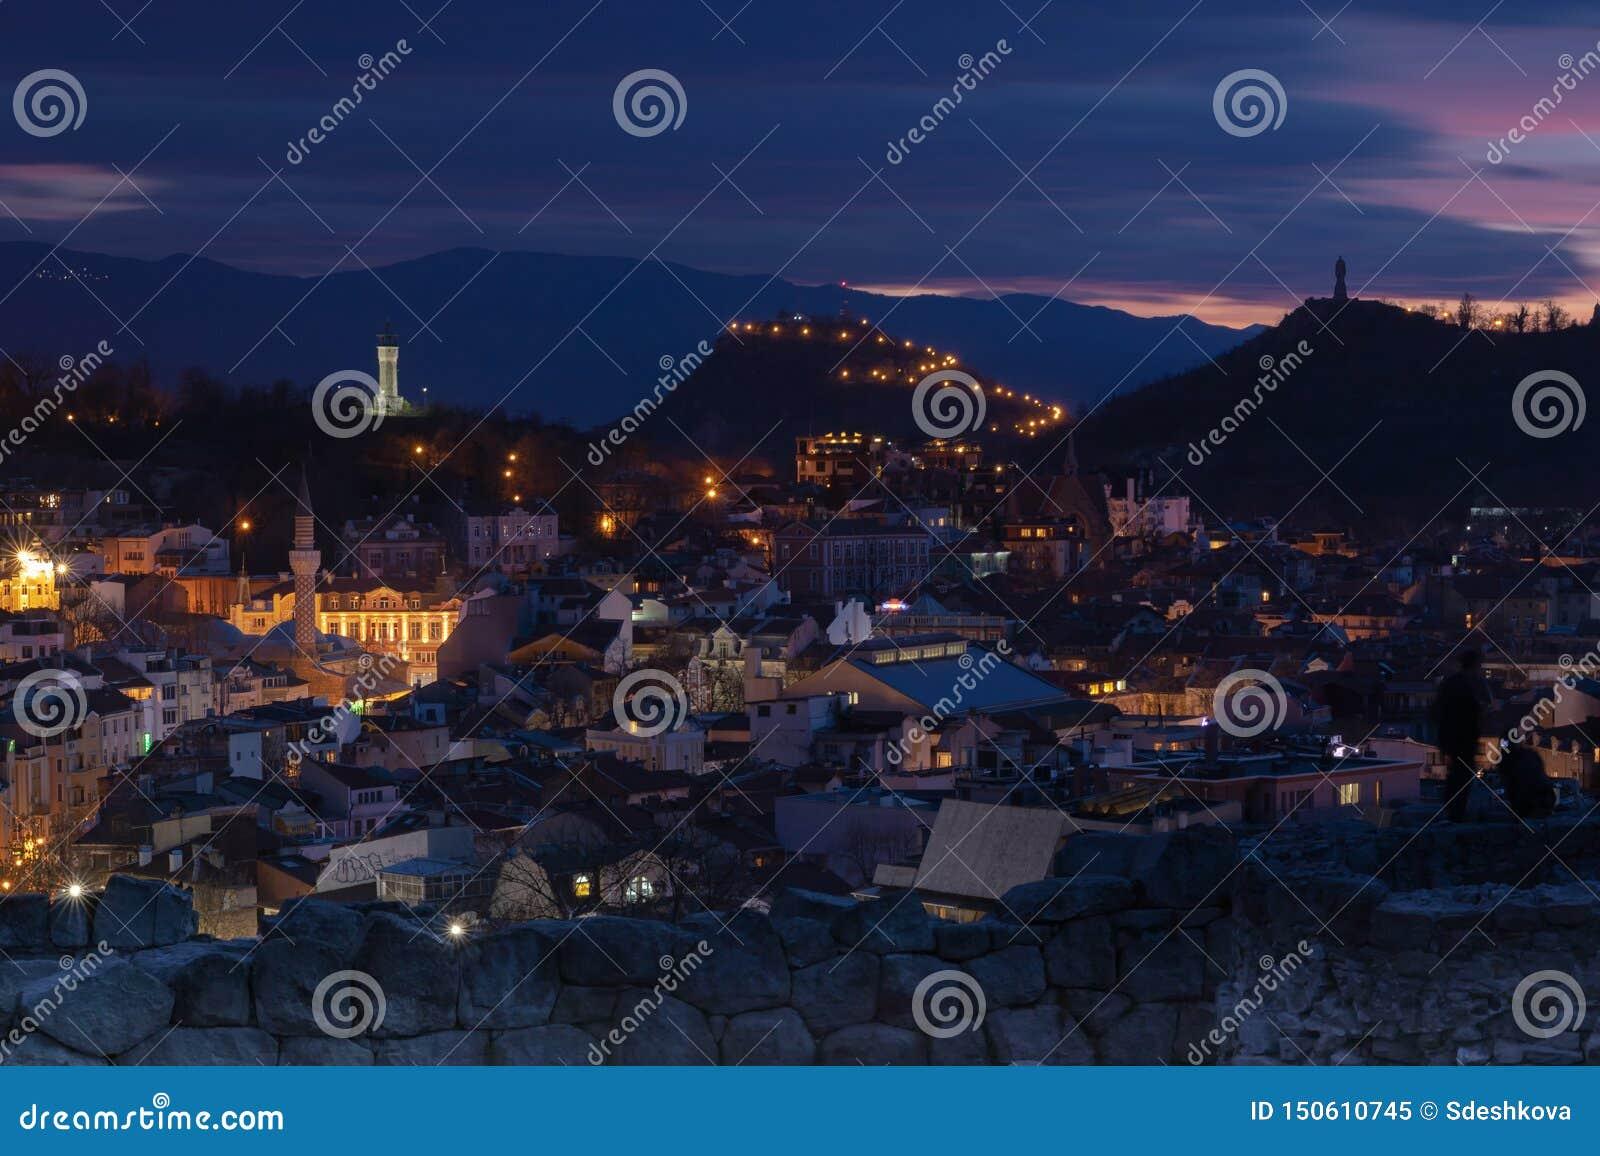 Plovdiv, Bulgaria at sunset - panoramic view